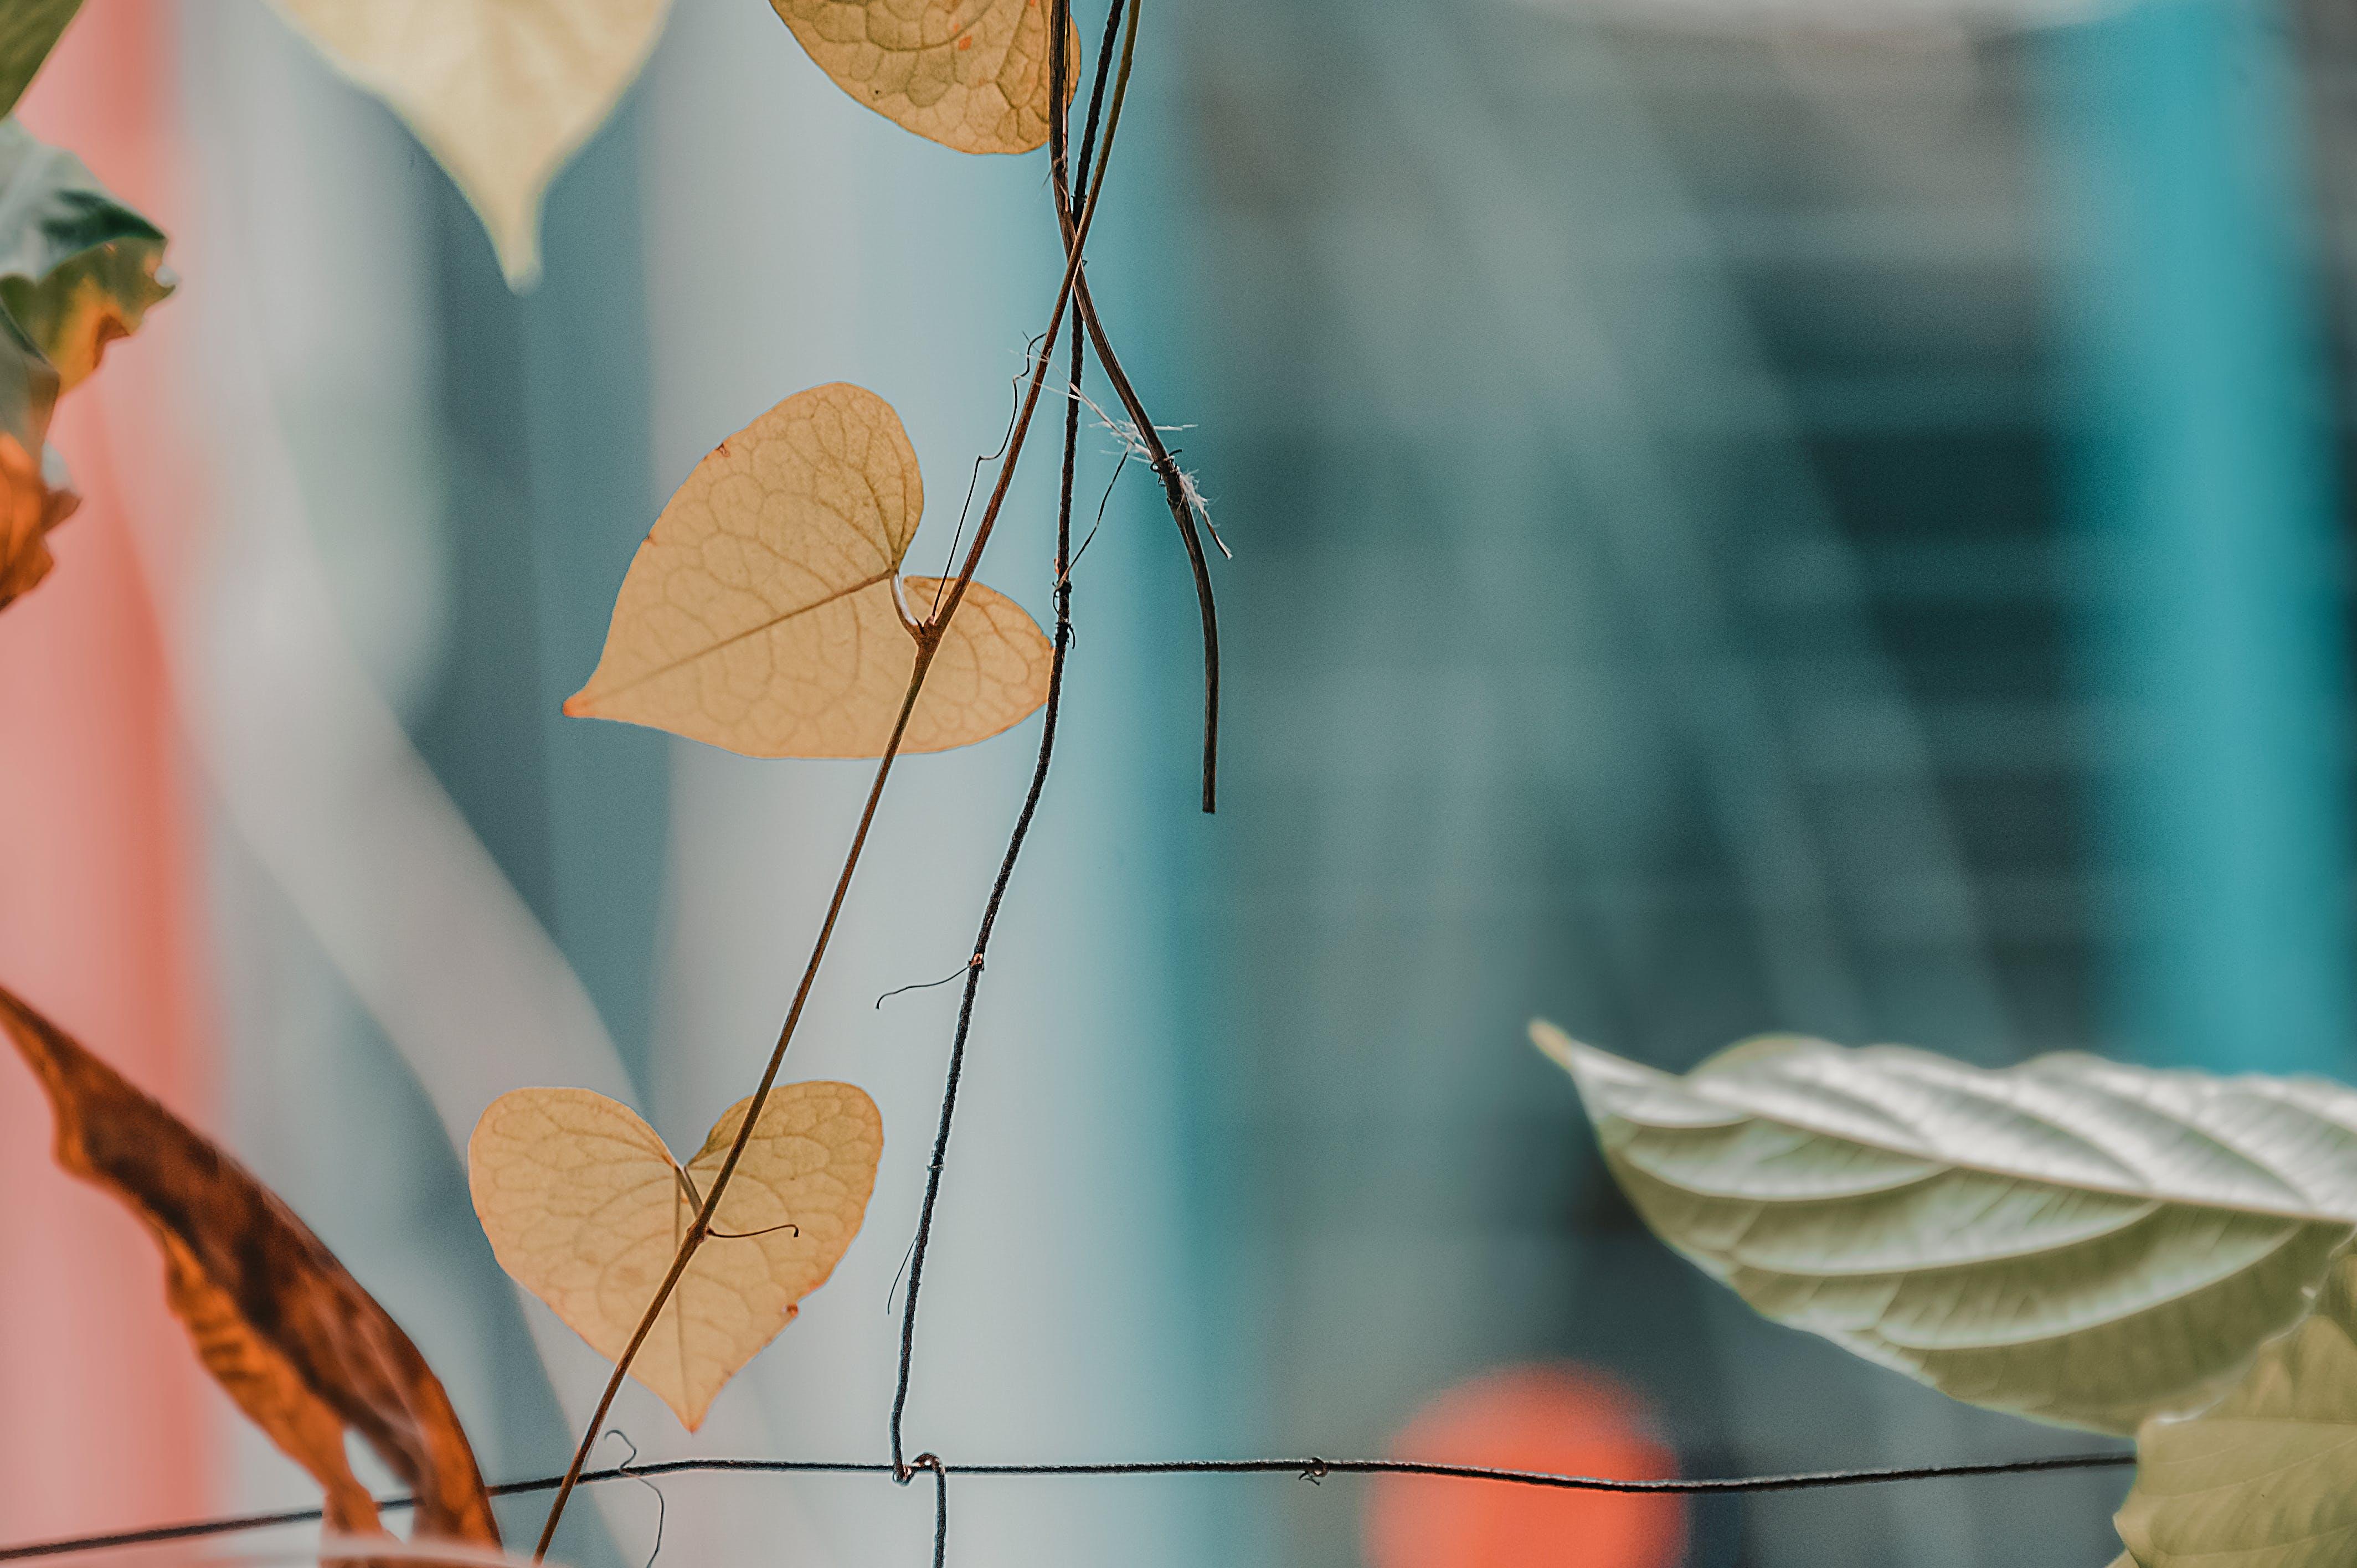 Ovate-shaped Beige Leaf